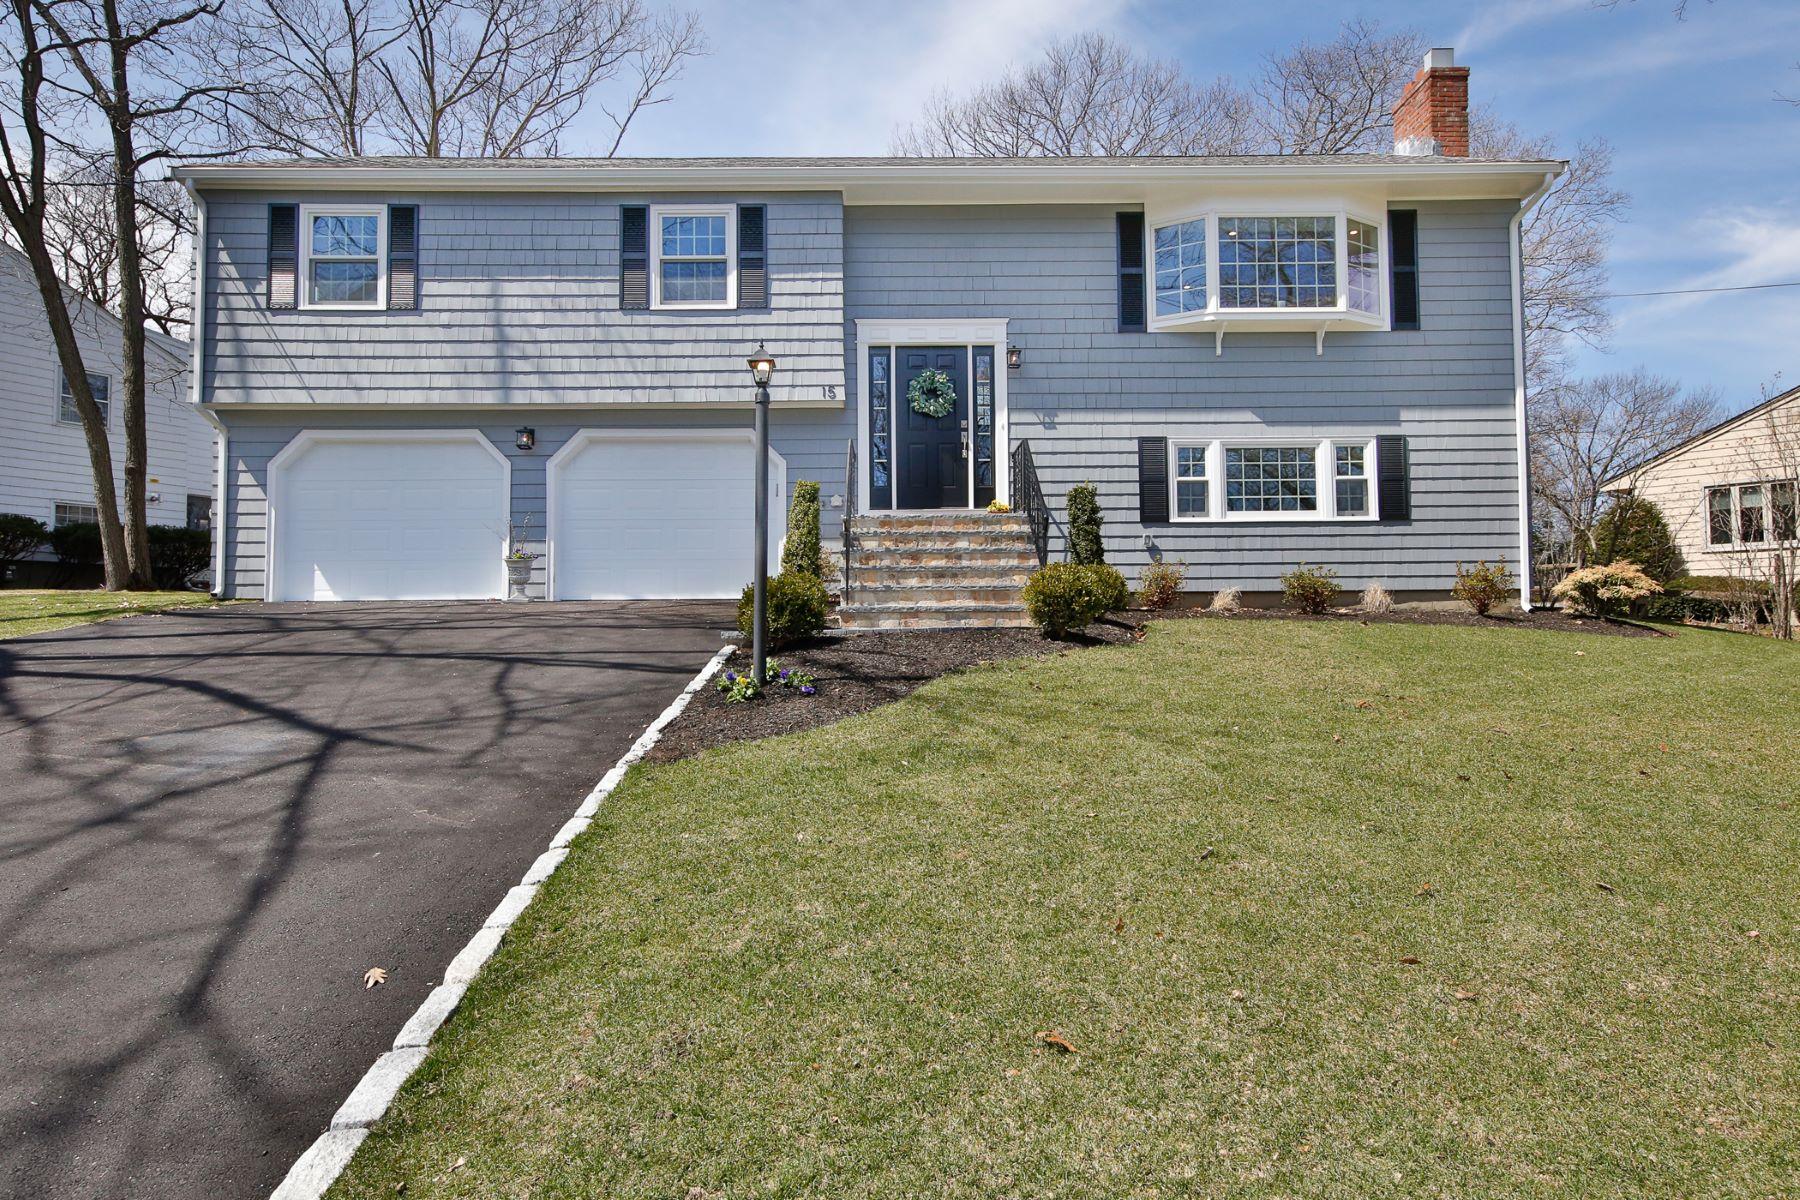 Single Family Home for Active at 15 Hartford Road, Arlington 15 Hartford Rd Arlington, Massachusetts 02474 United States